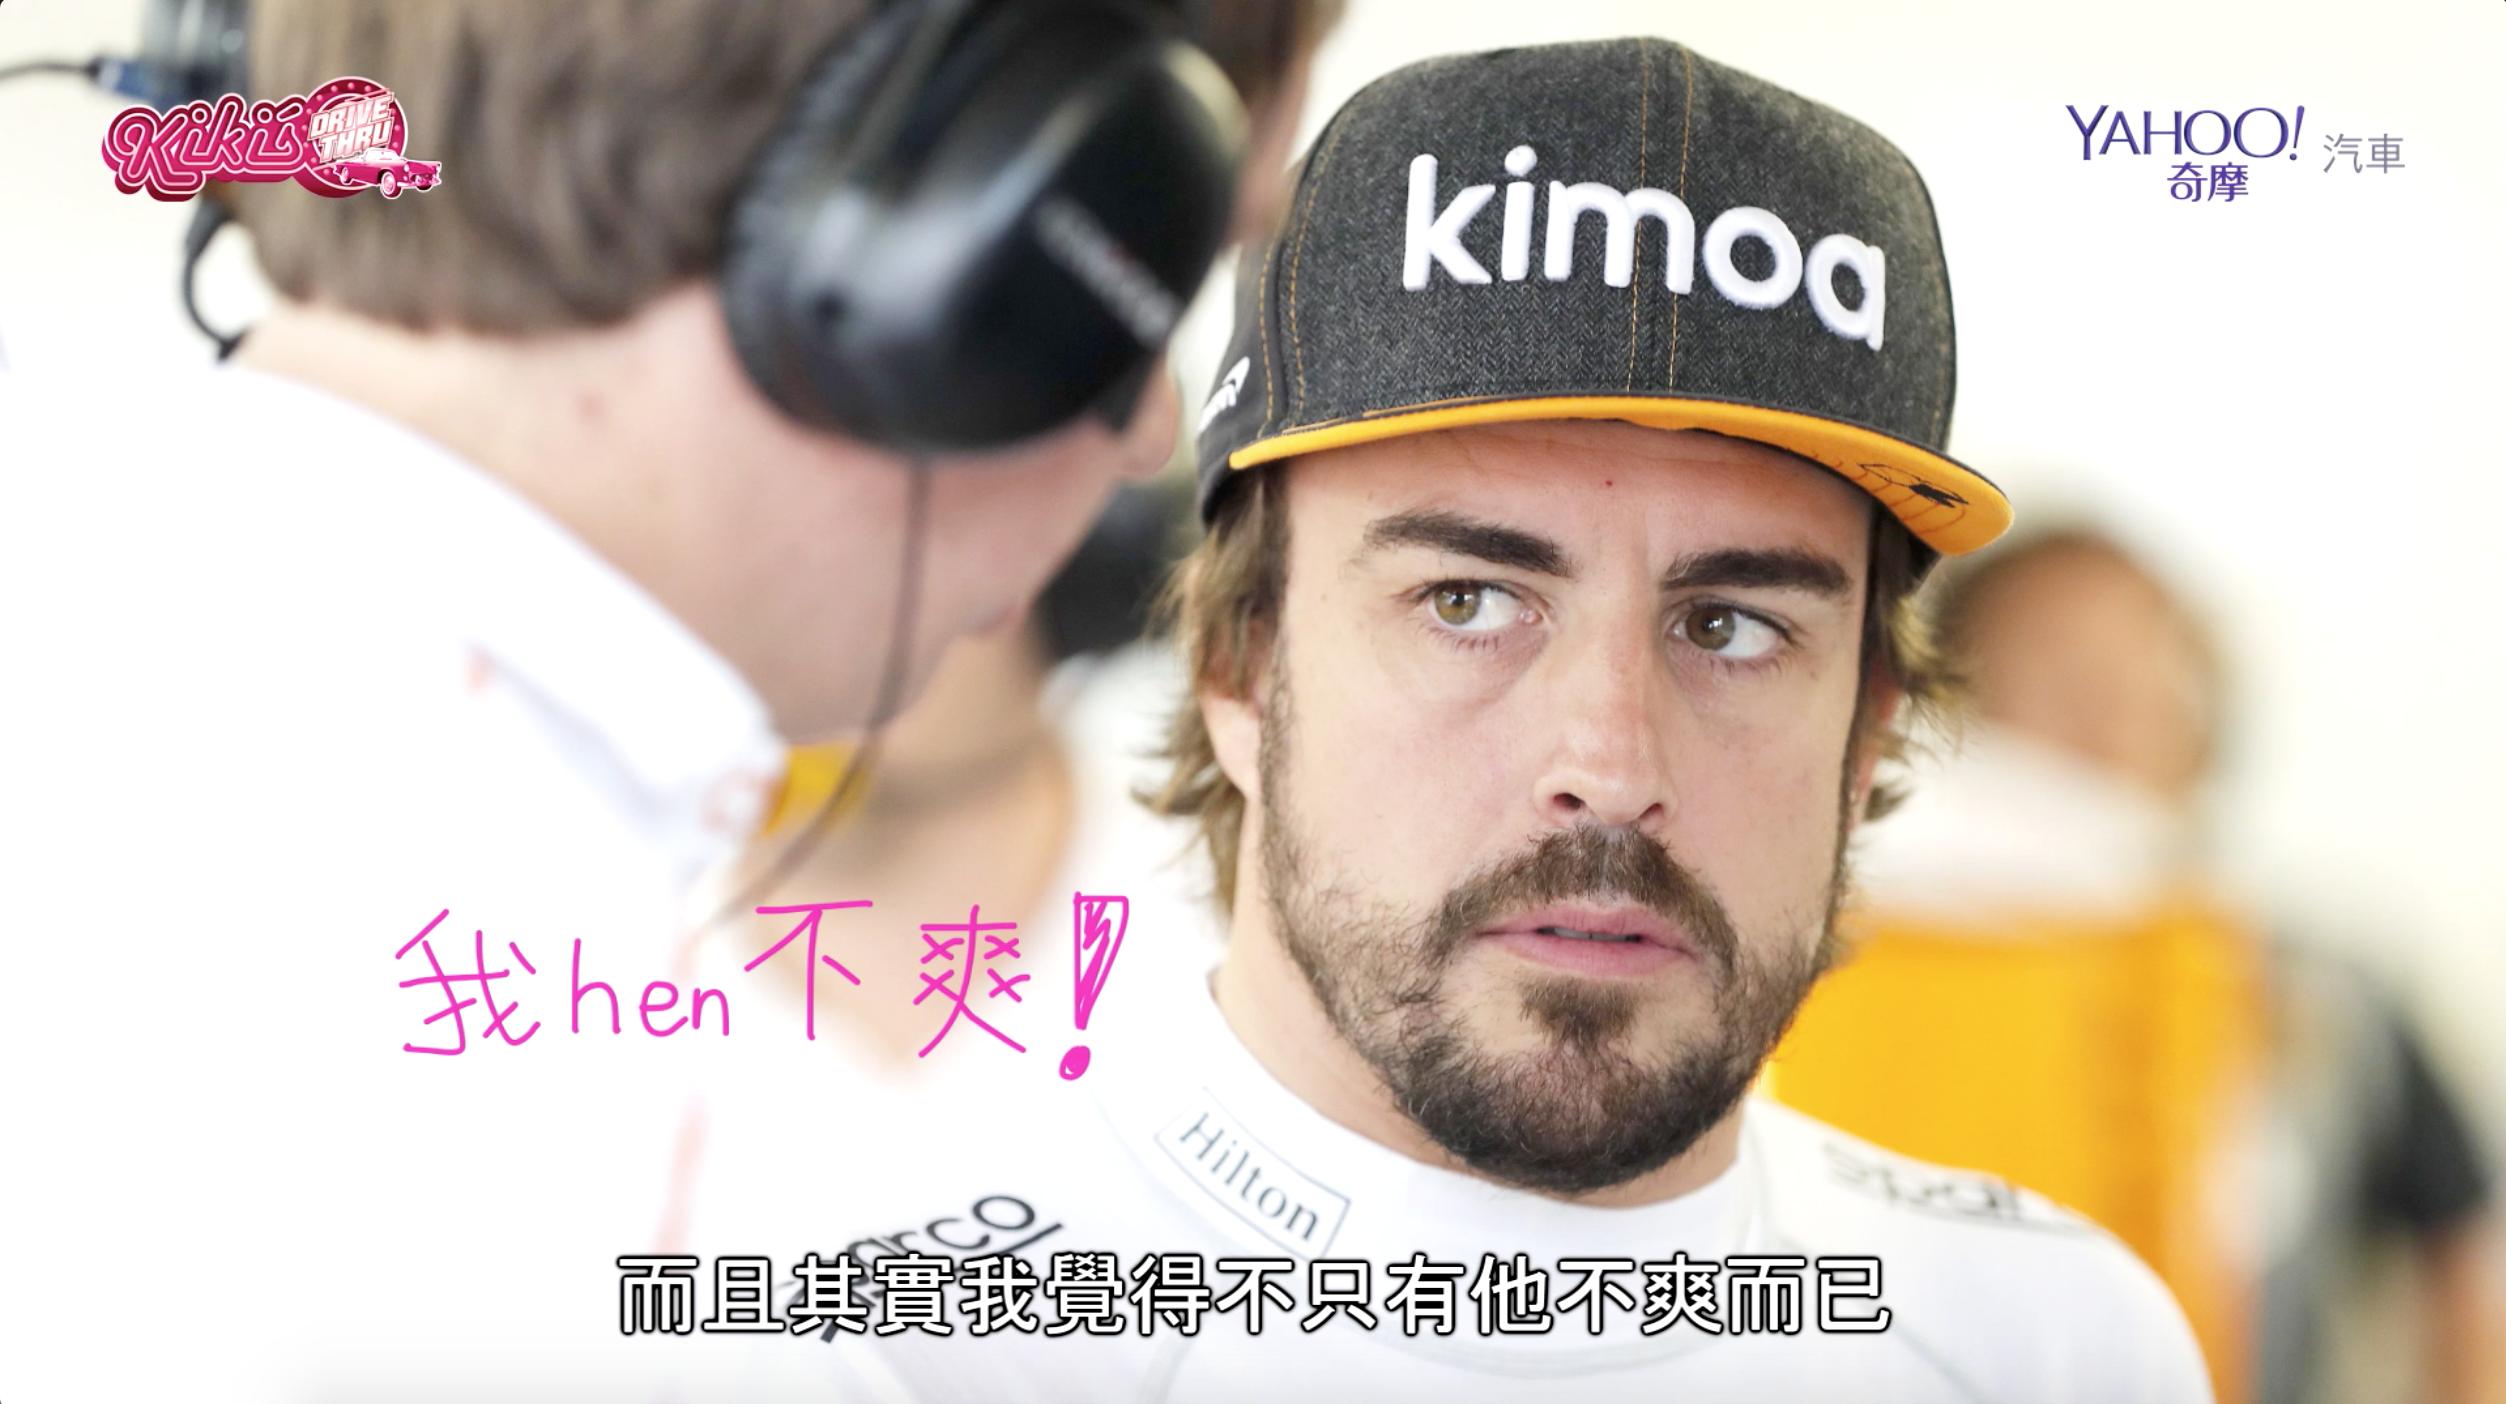 【Kiki's Drive-Thru】Vol.4 McLaren車隊歷史介紹 / 交通事故扶起機車需熄火